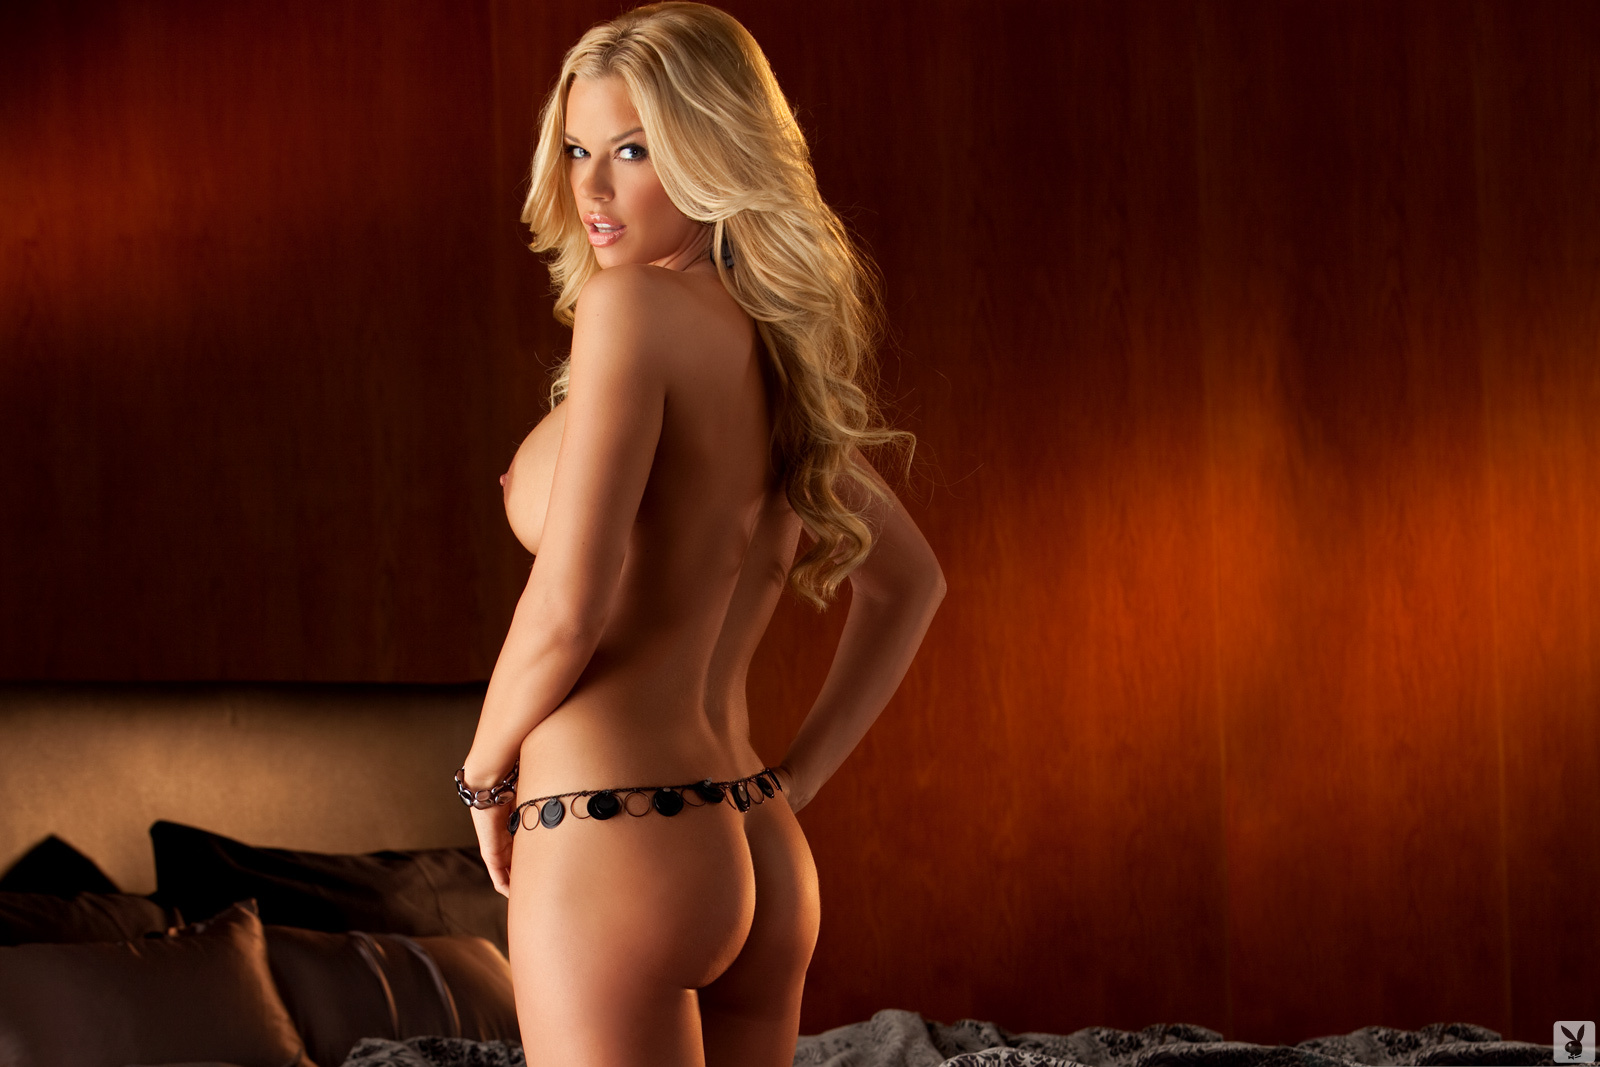 ero-modeli-blondinki